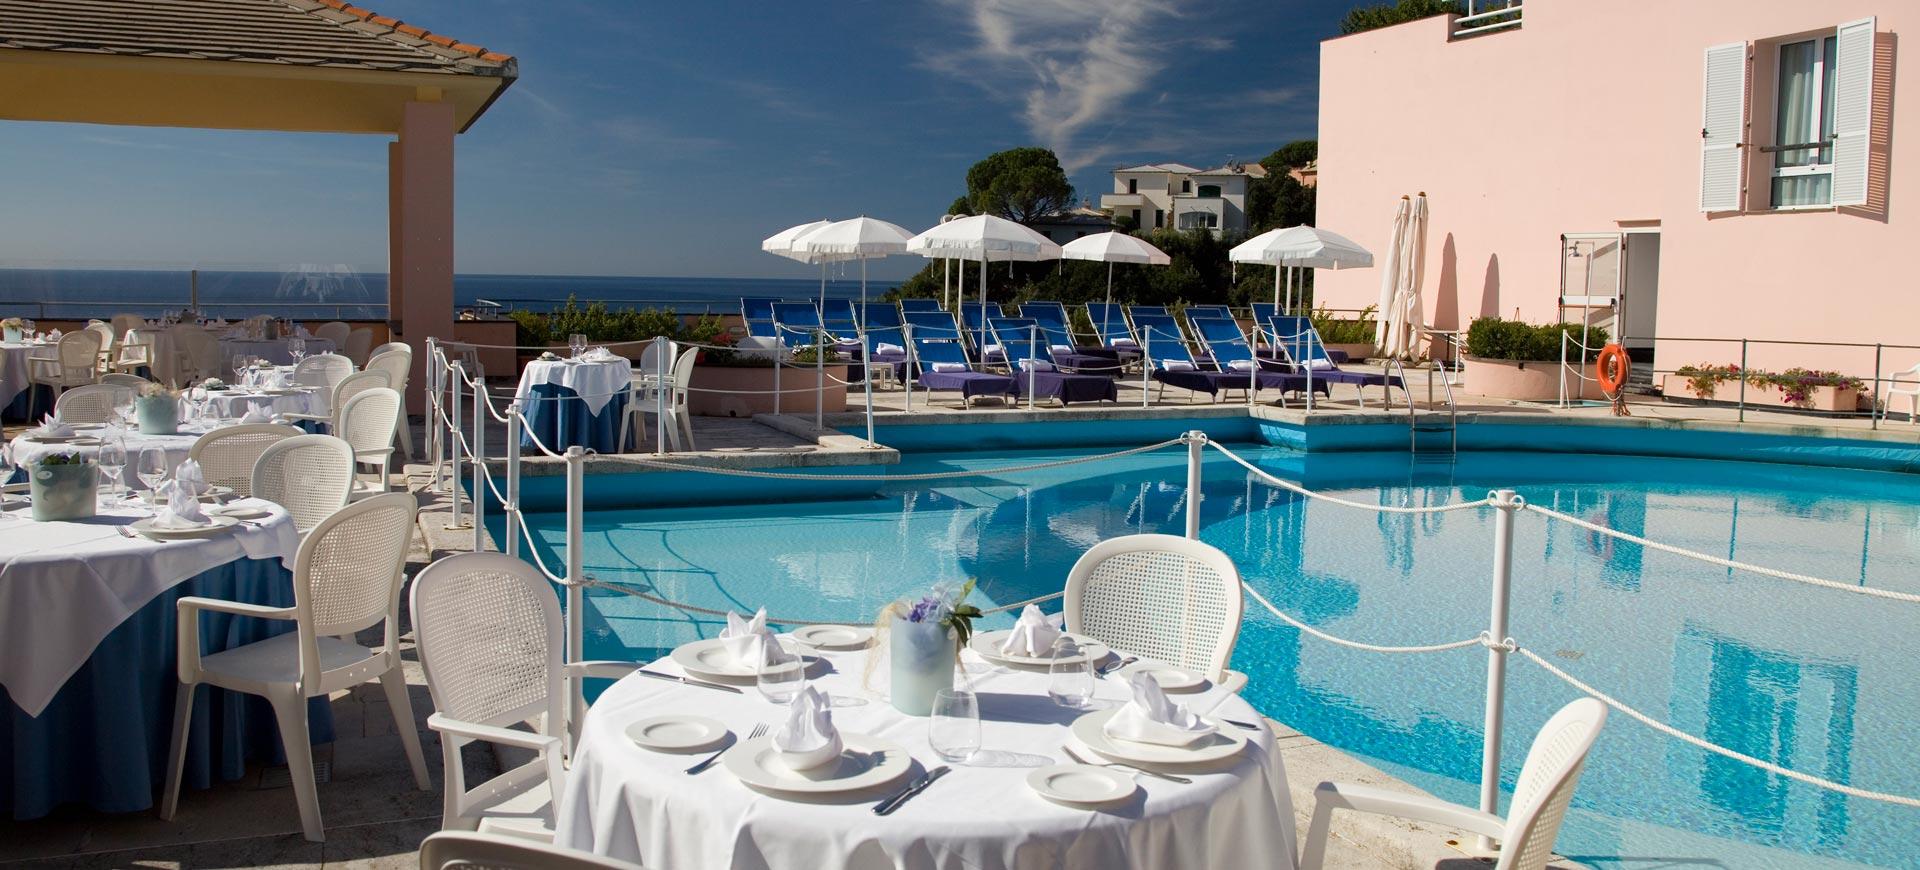 Banquets Restaurant Arenzano - Genova